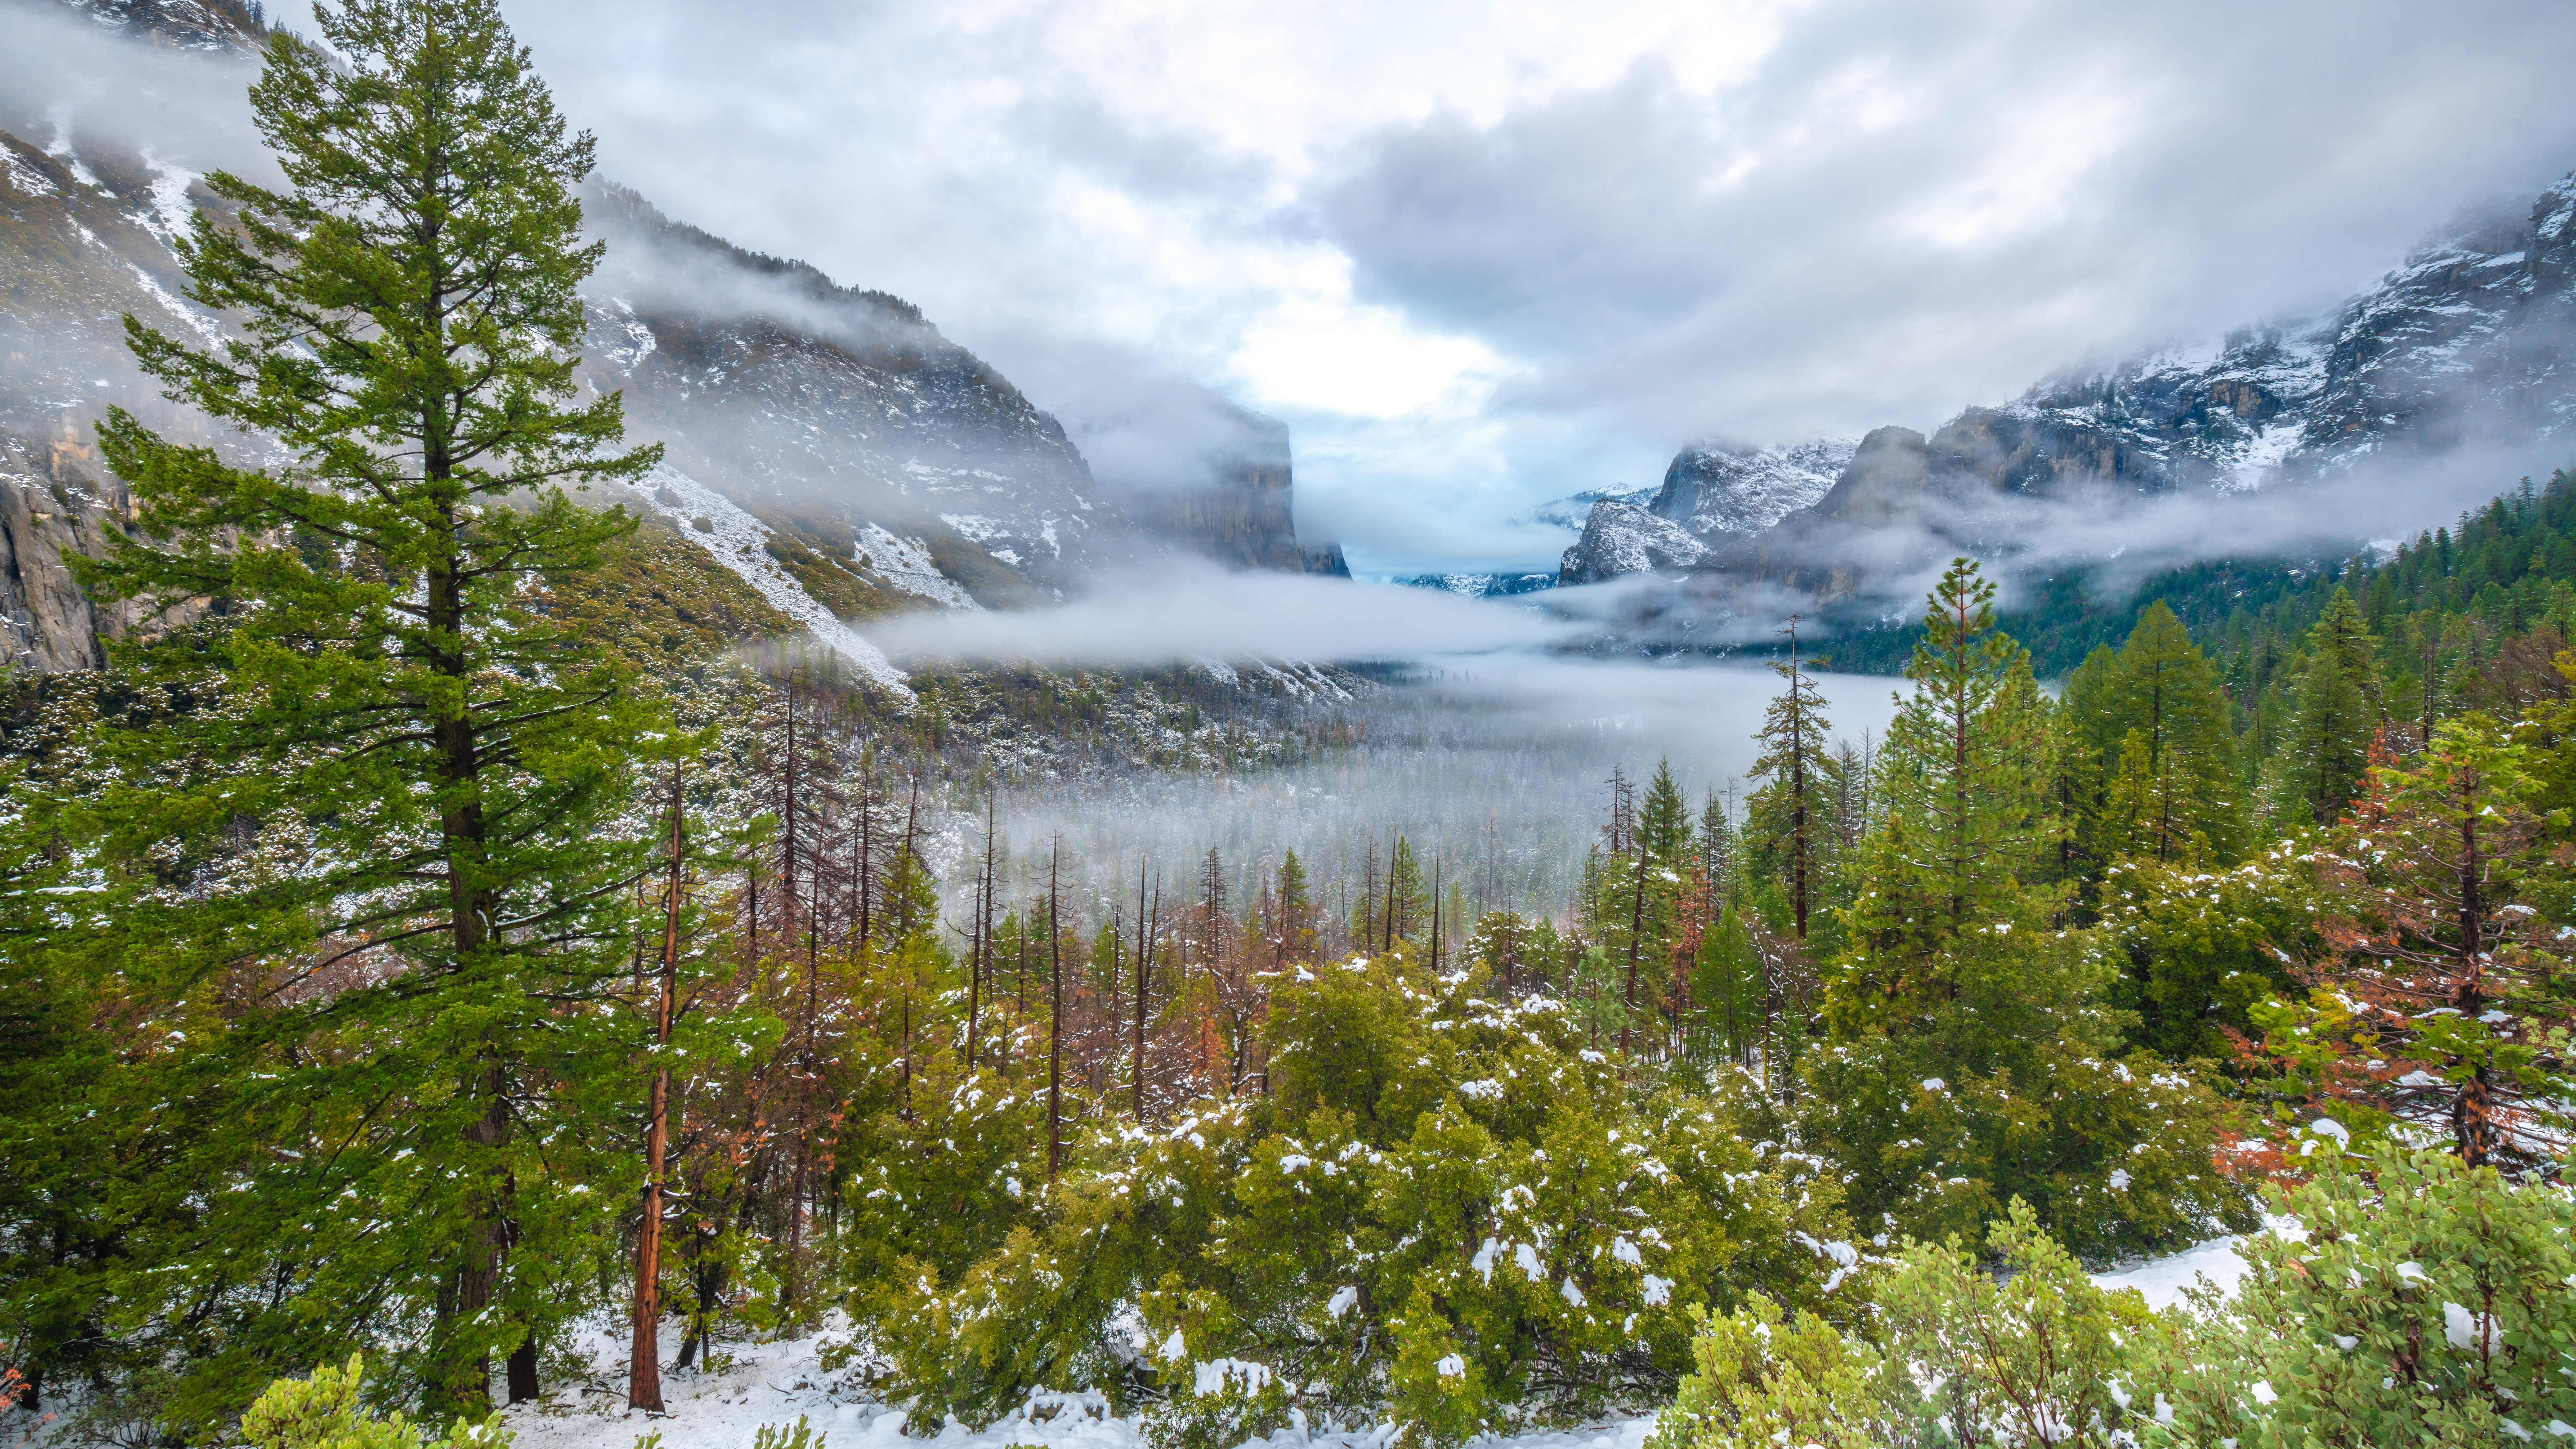 Yosemite Valley winter scenery wallpaper